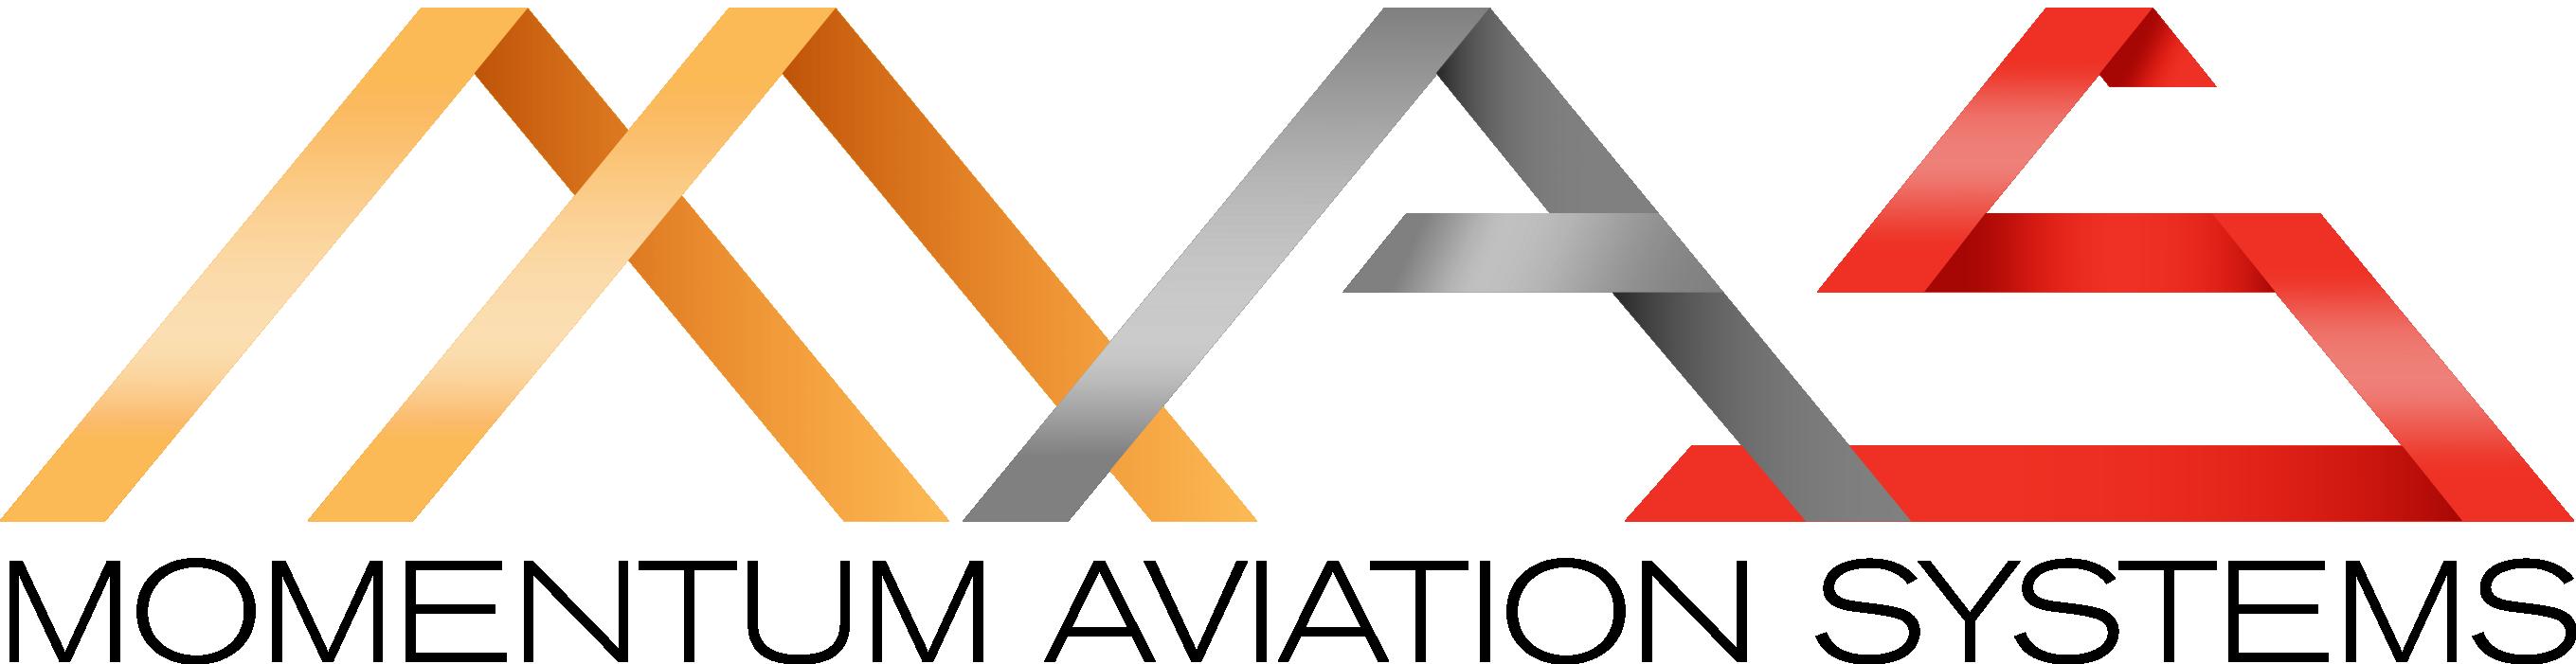 Momentum Aviation Systems Logo